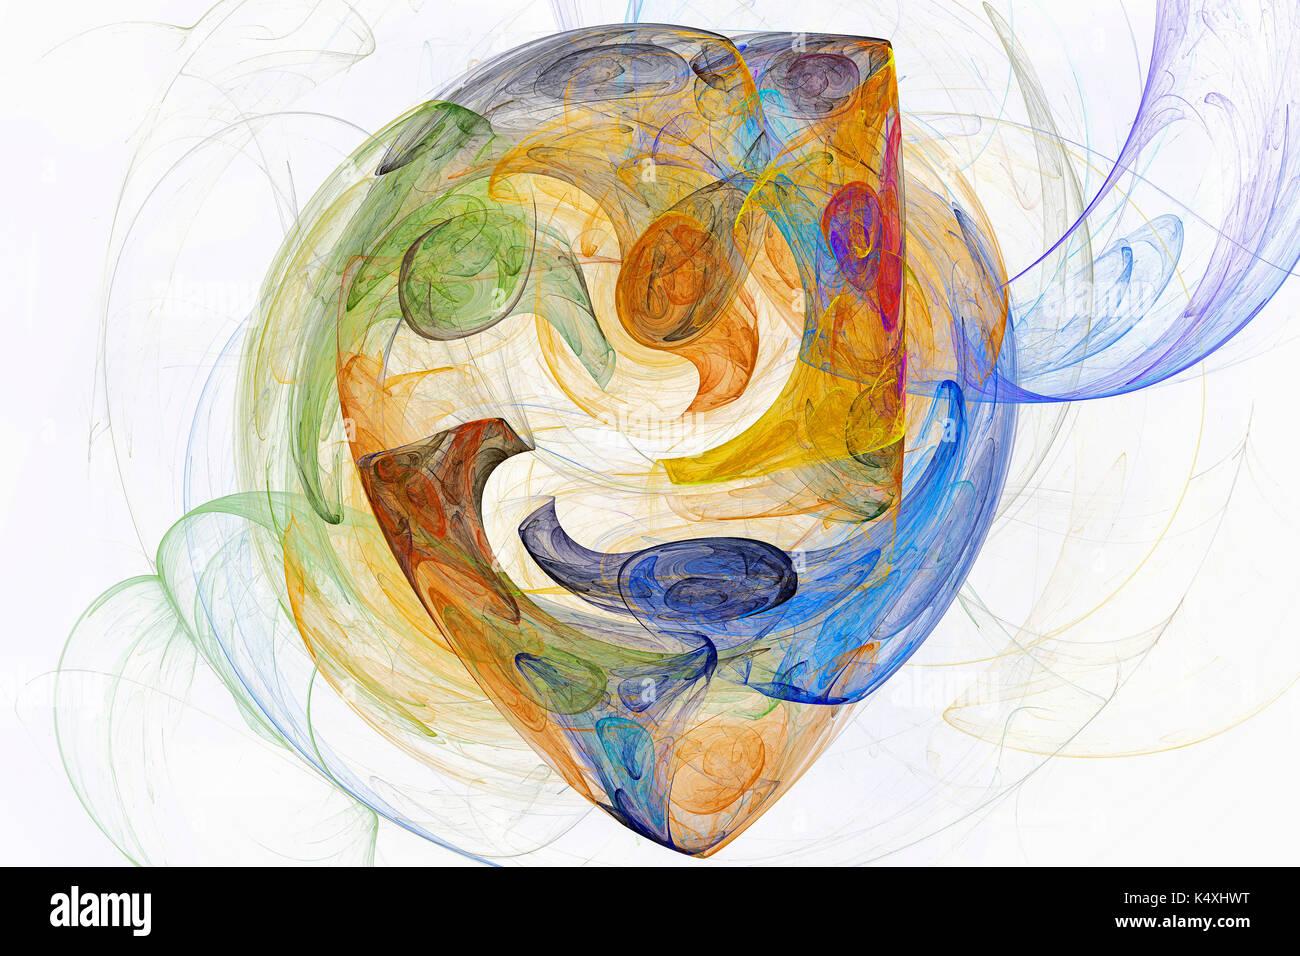 Digital art drawing - The mask - Stock Image